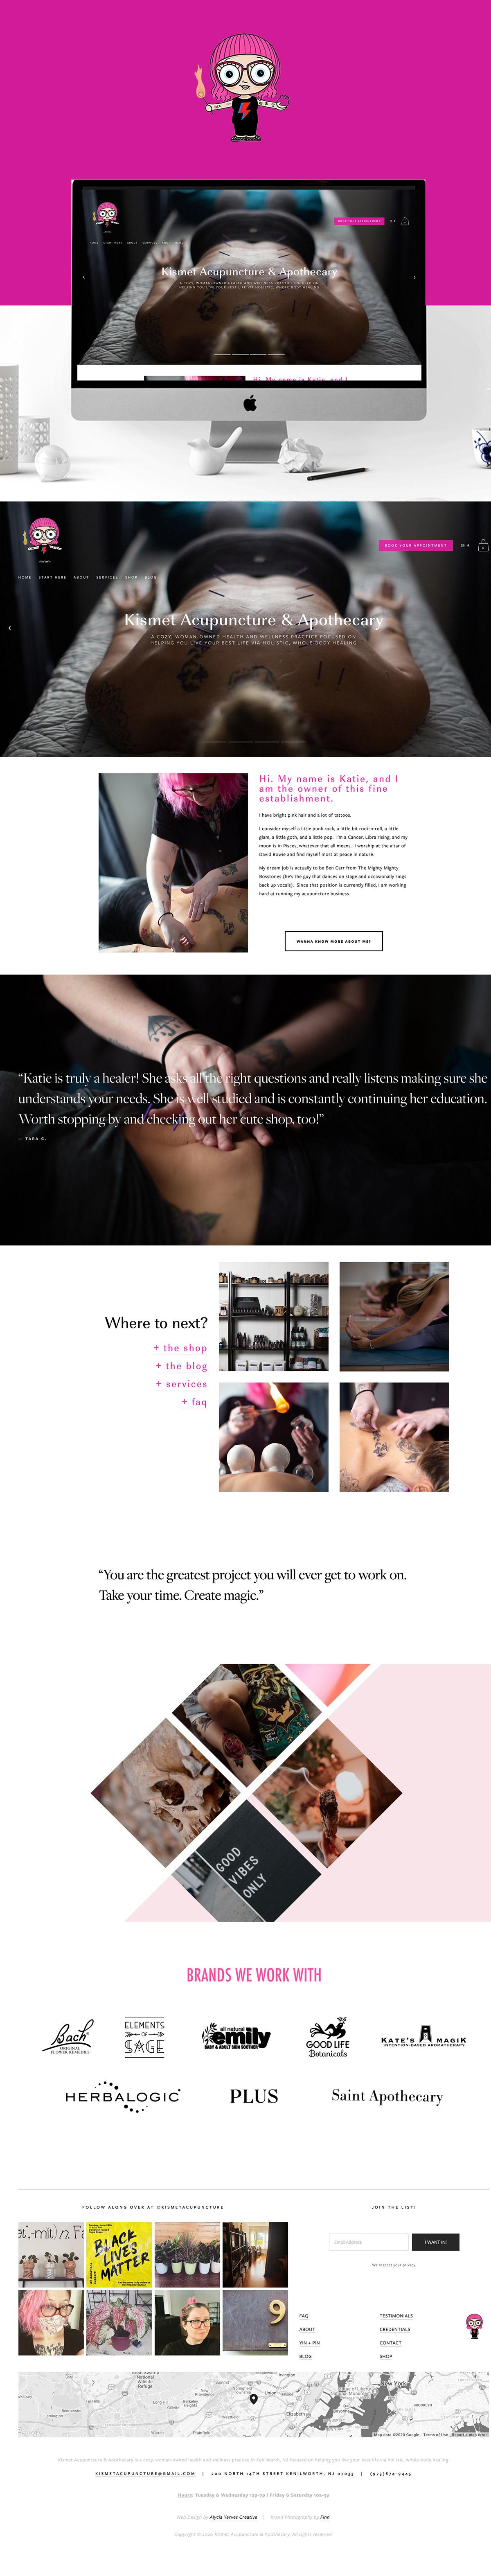 acupuncture branding  business Creative Direction  design pink Web Design  web dev Website Wellness